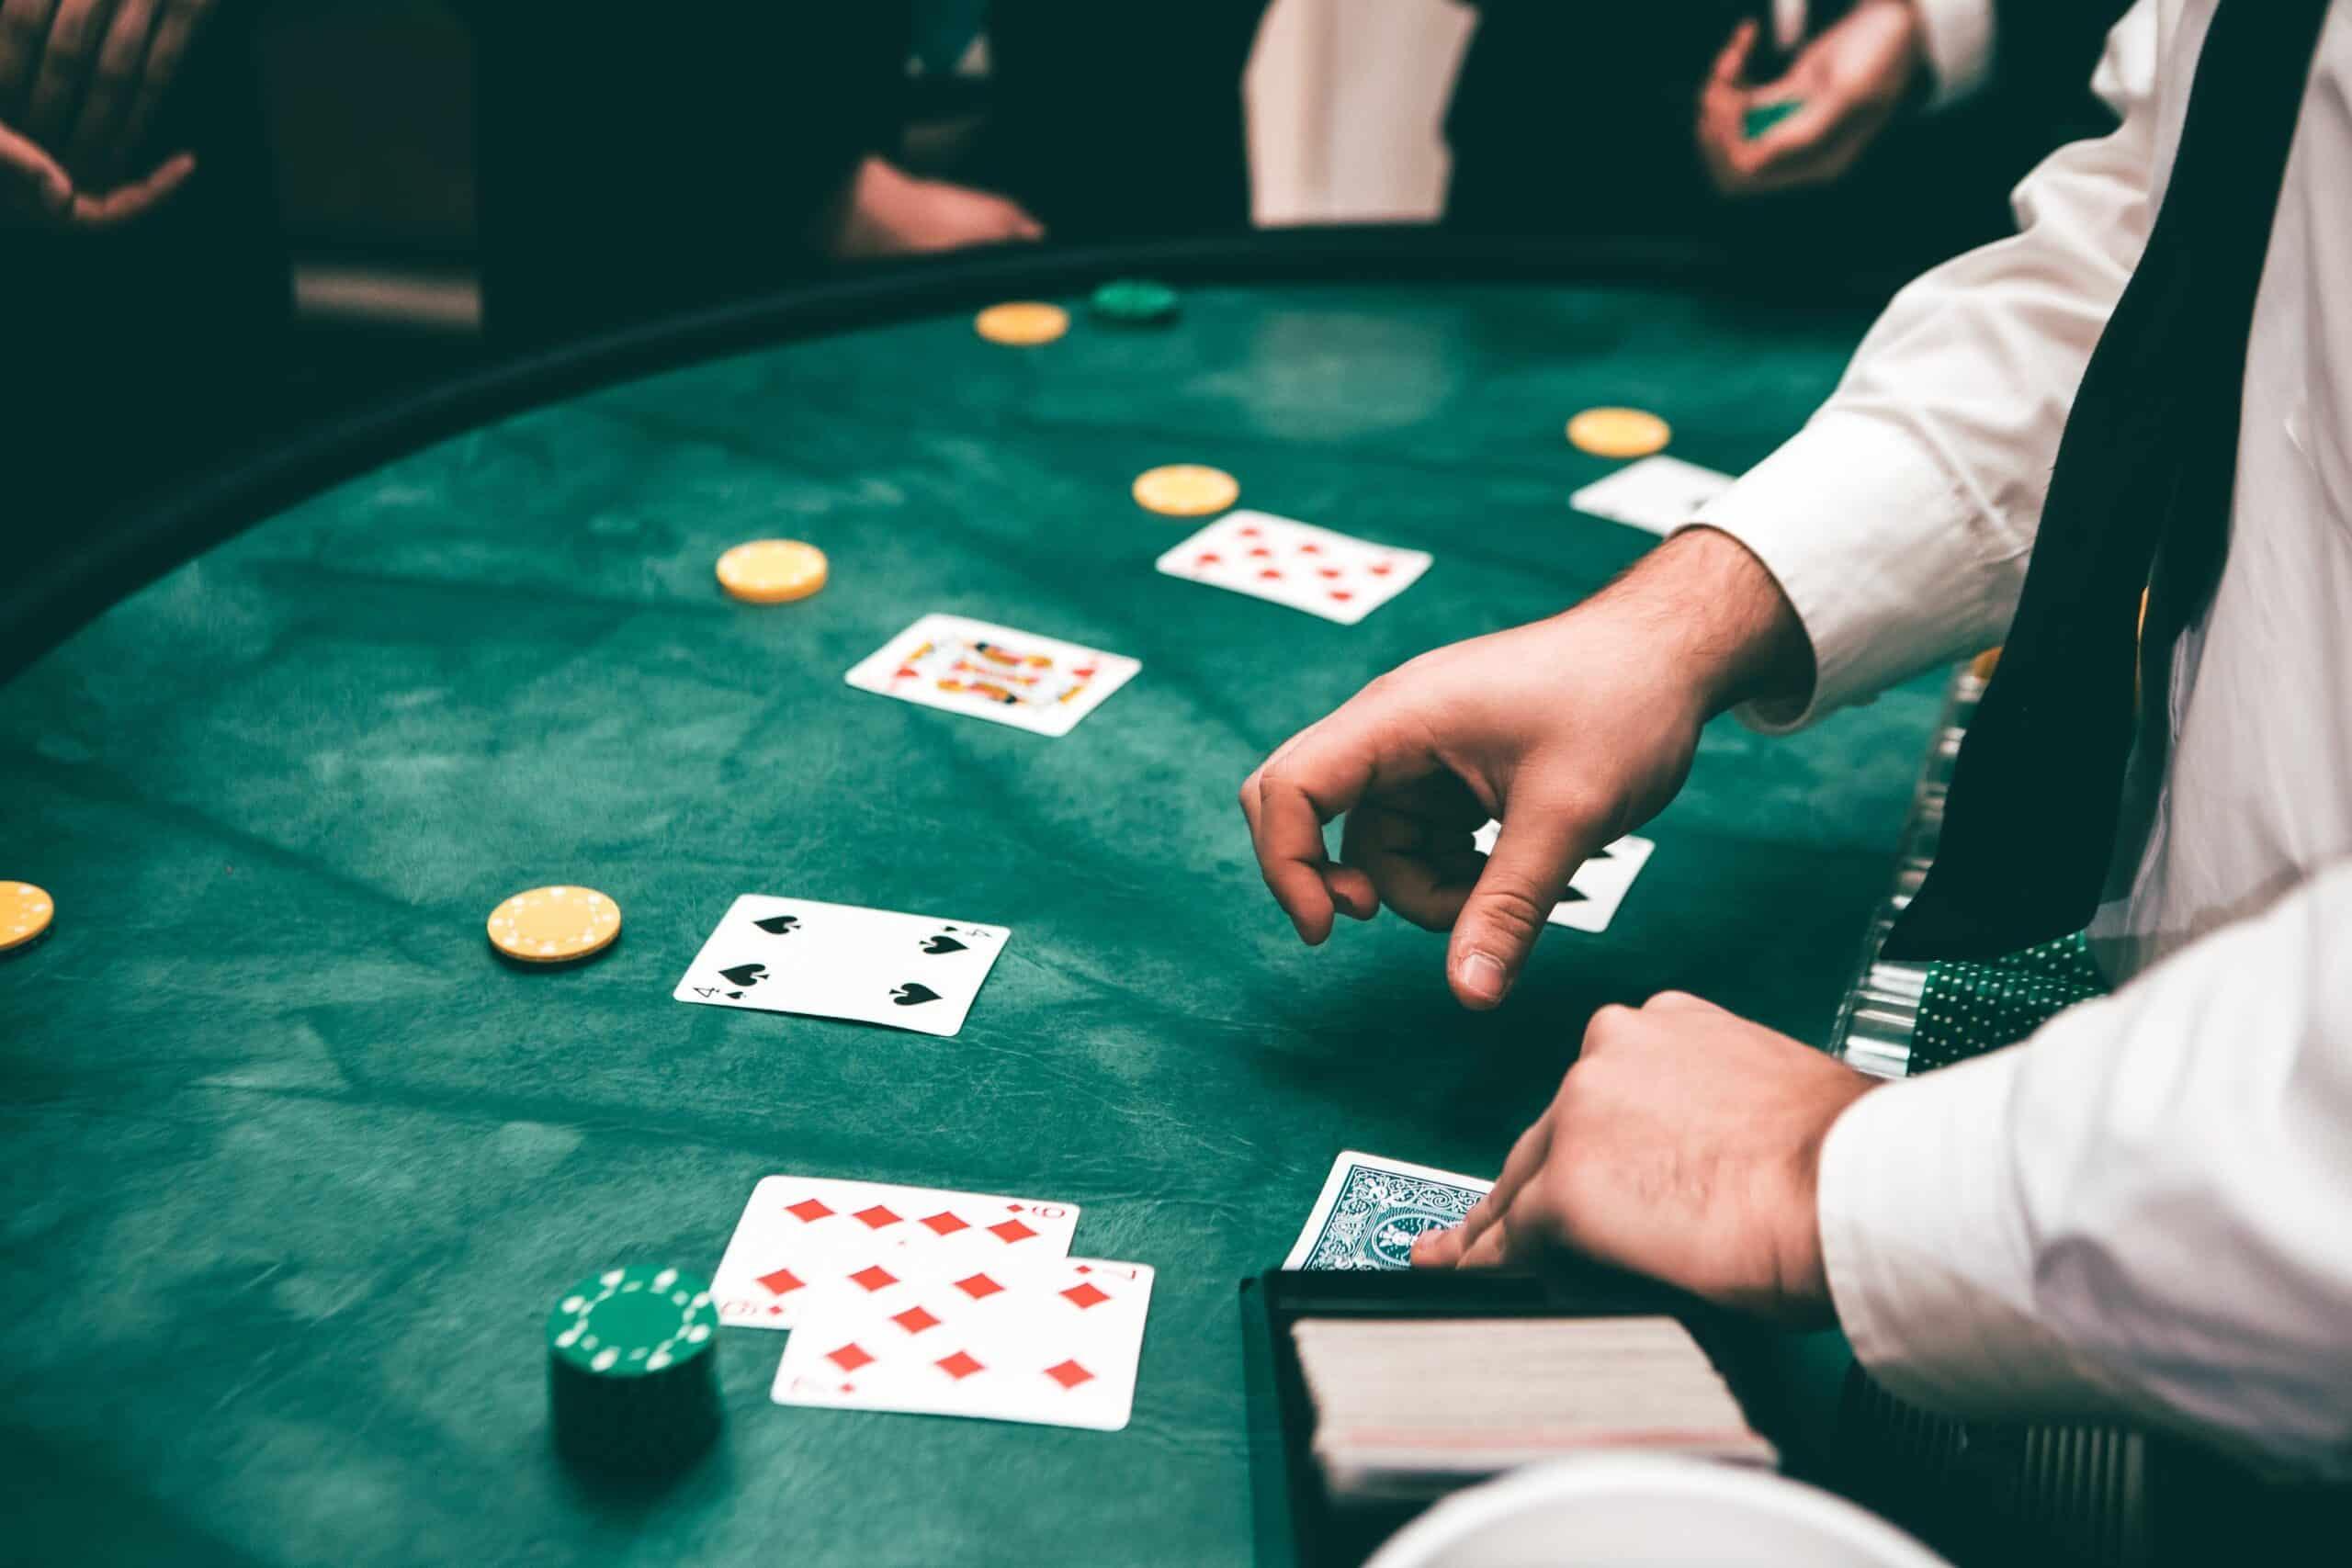 Giochi Poker Texano gratis